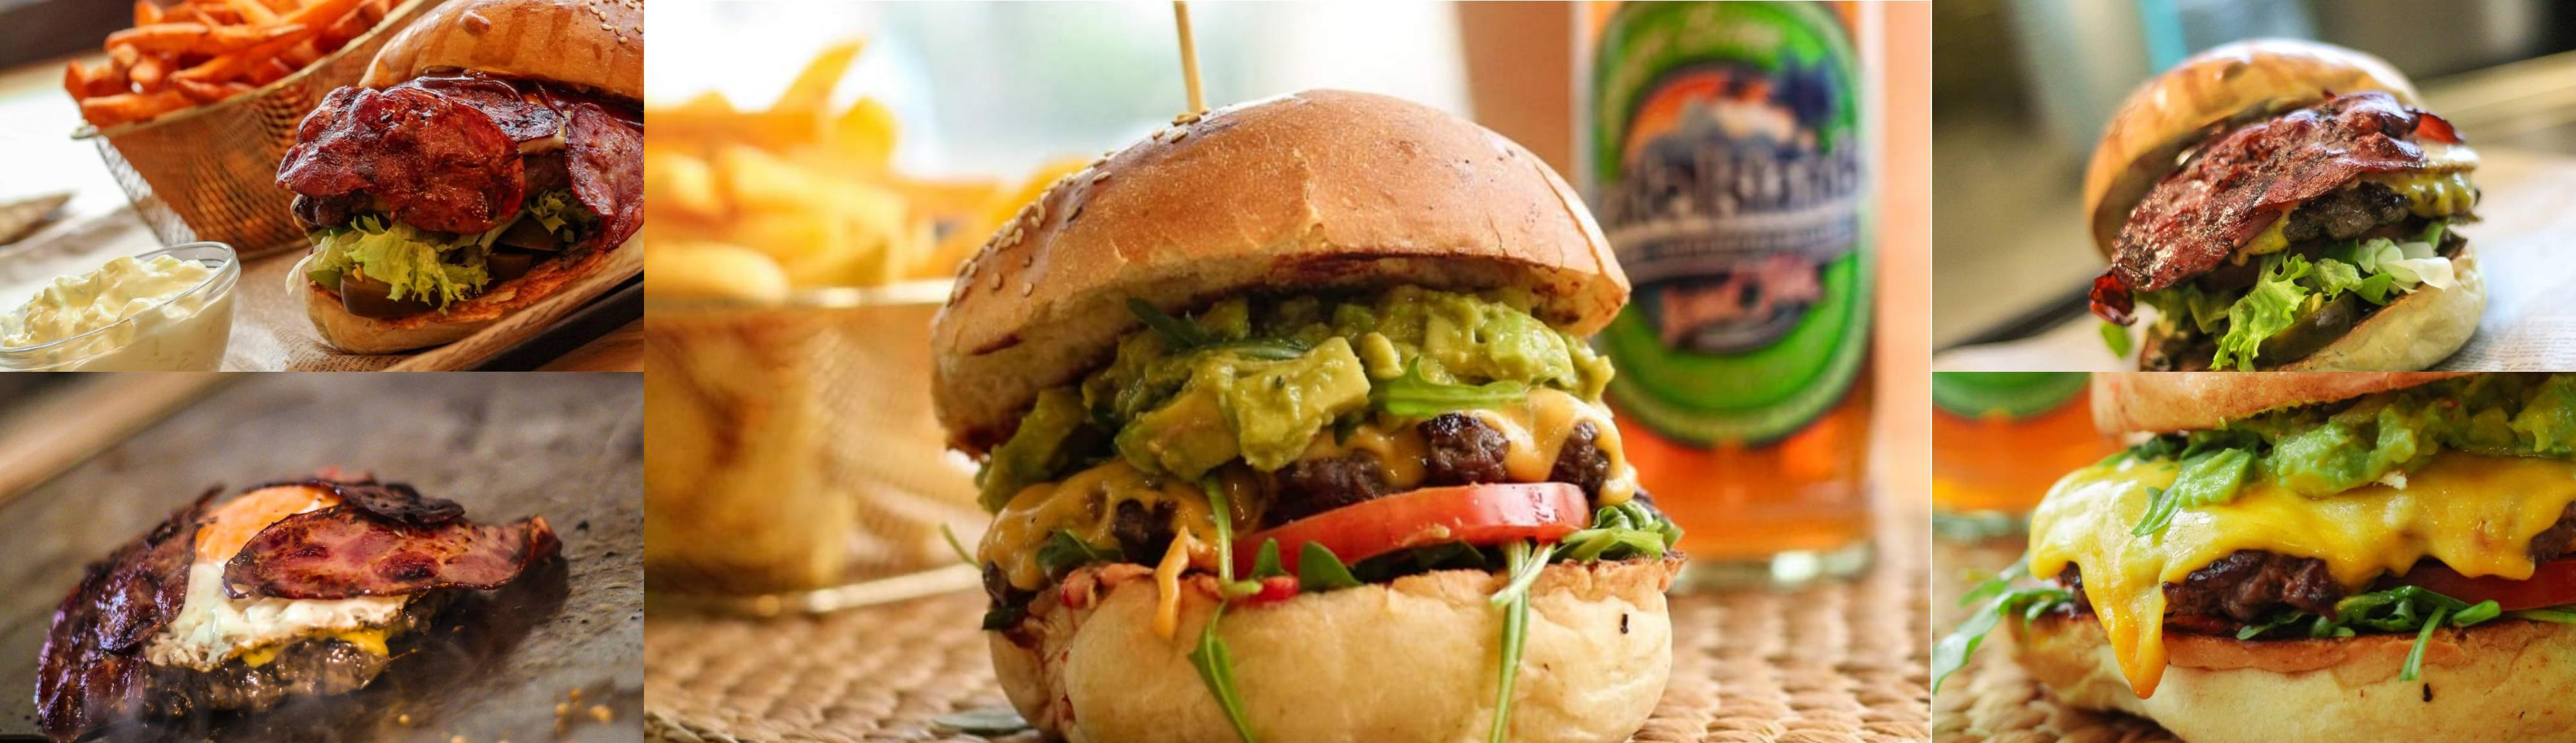 Burger-collage